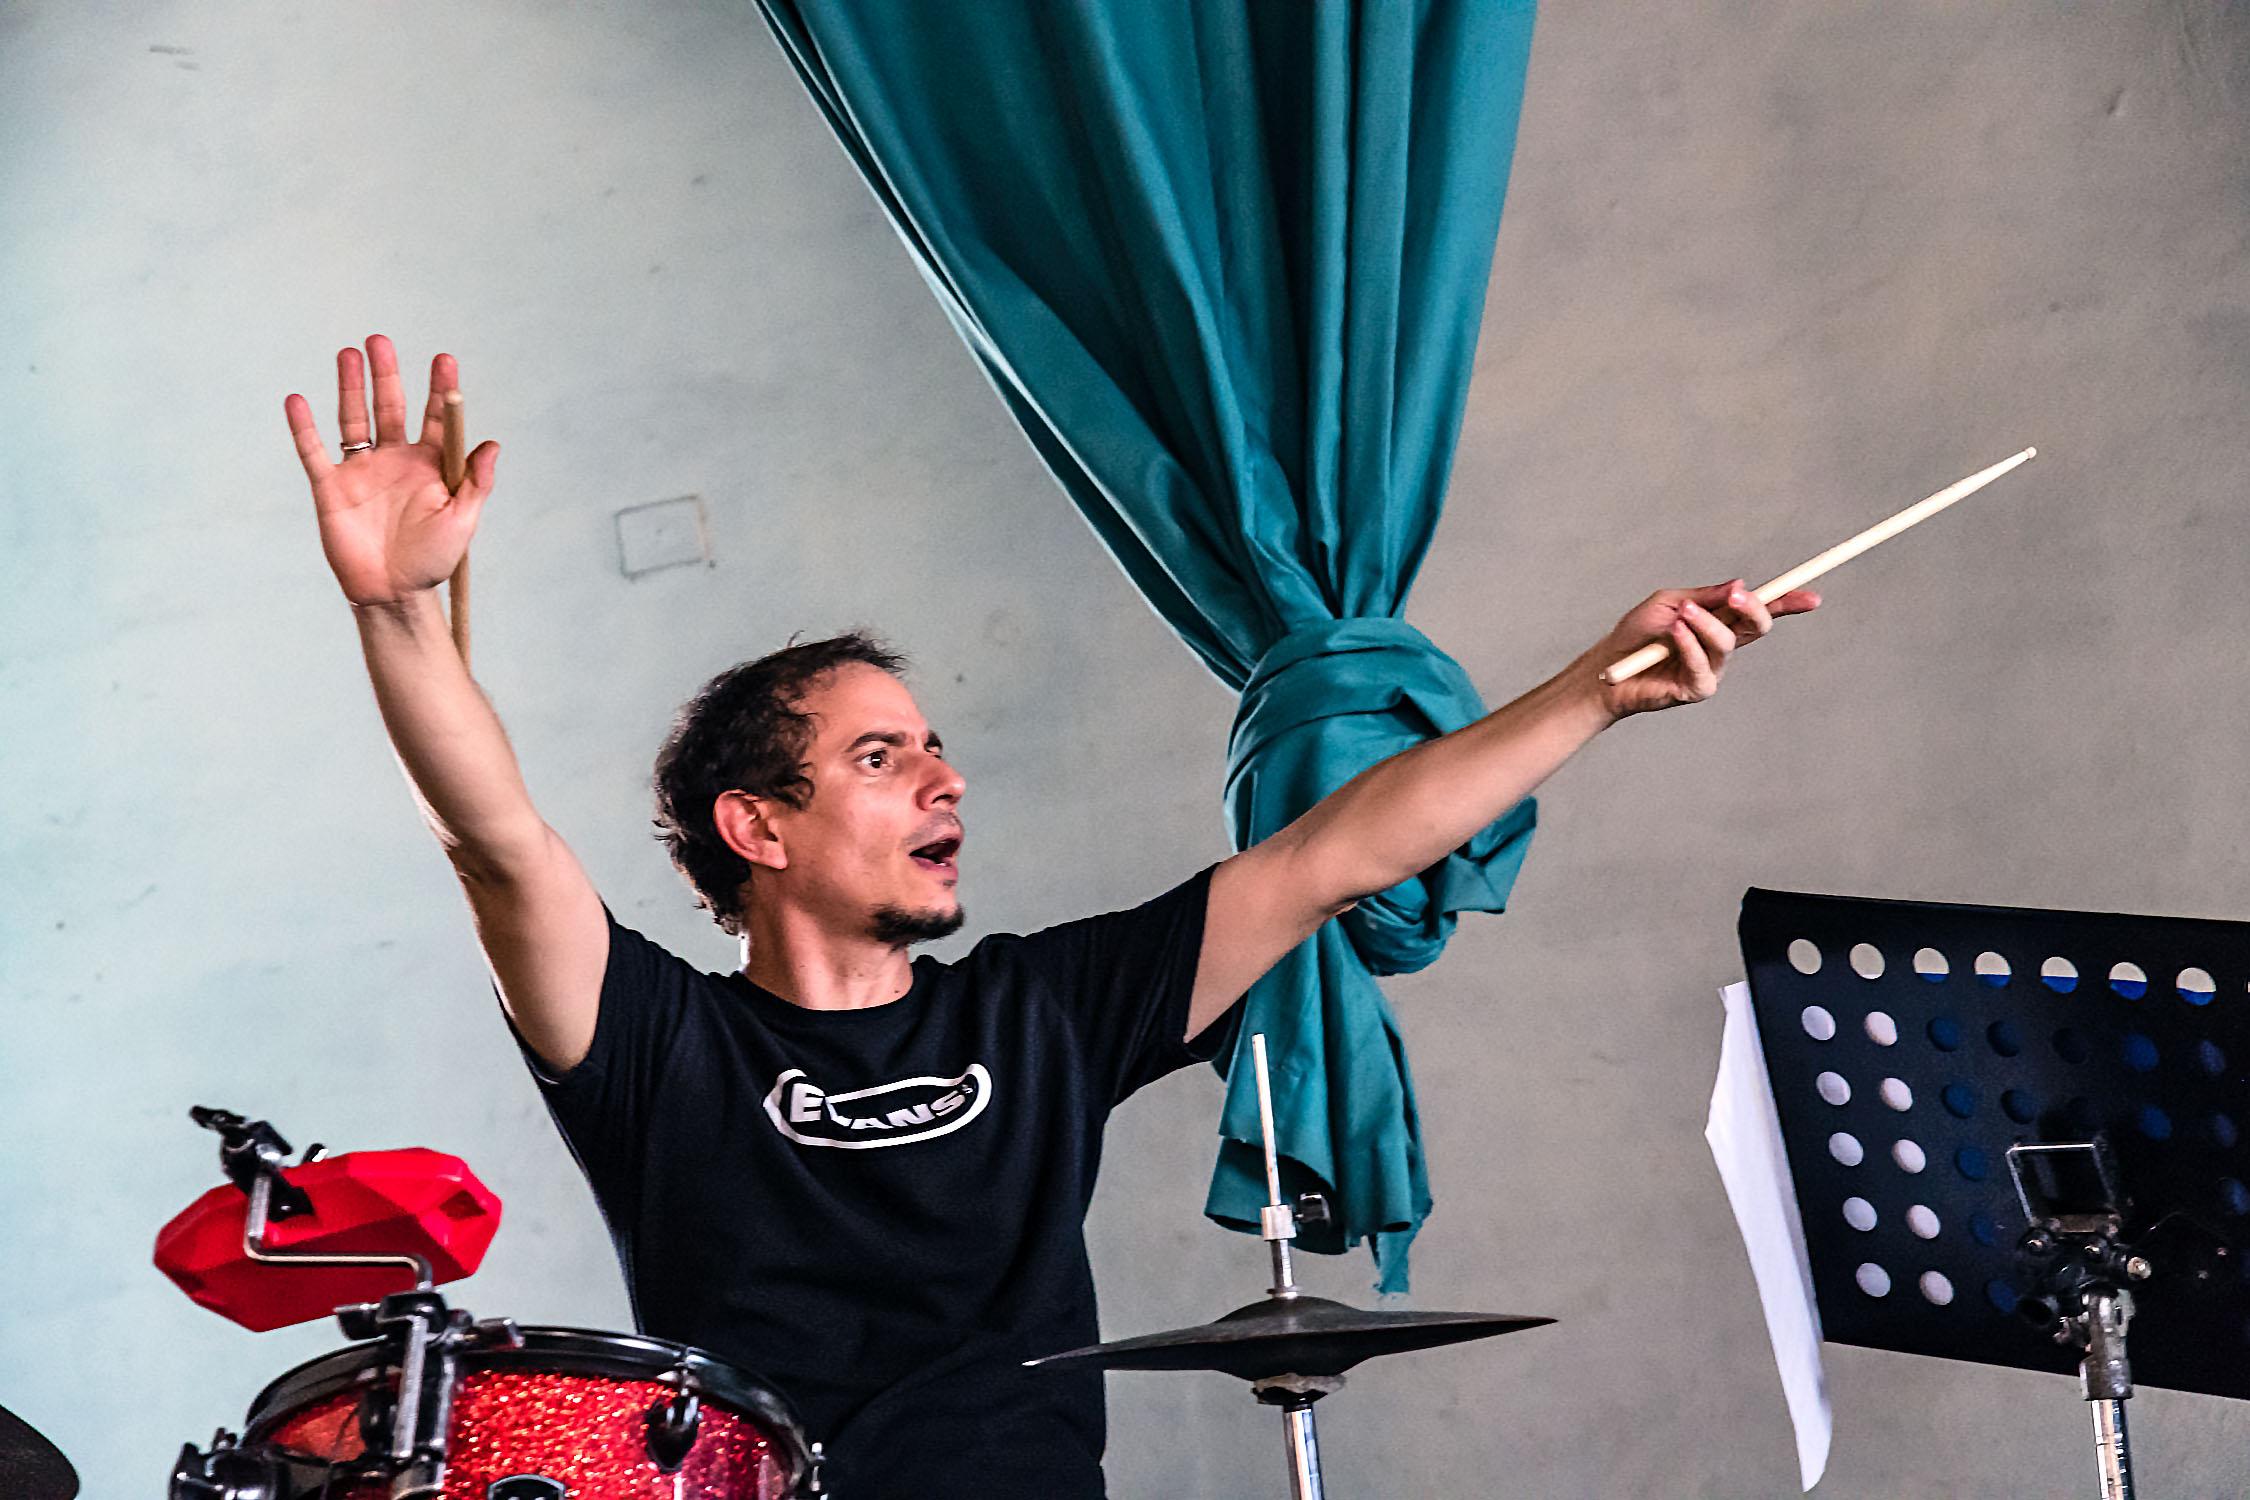 Dafnis Prieto at Dafnis Prieto Big Band rehearsal at Amadeo Roldan Conservatory, Havana, Cuba, January 2019 (Photo by David Garten)